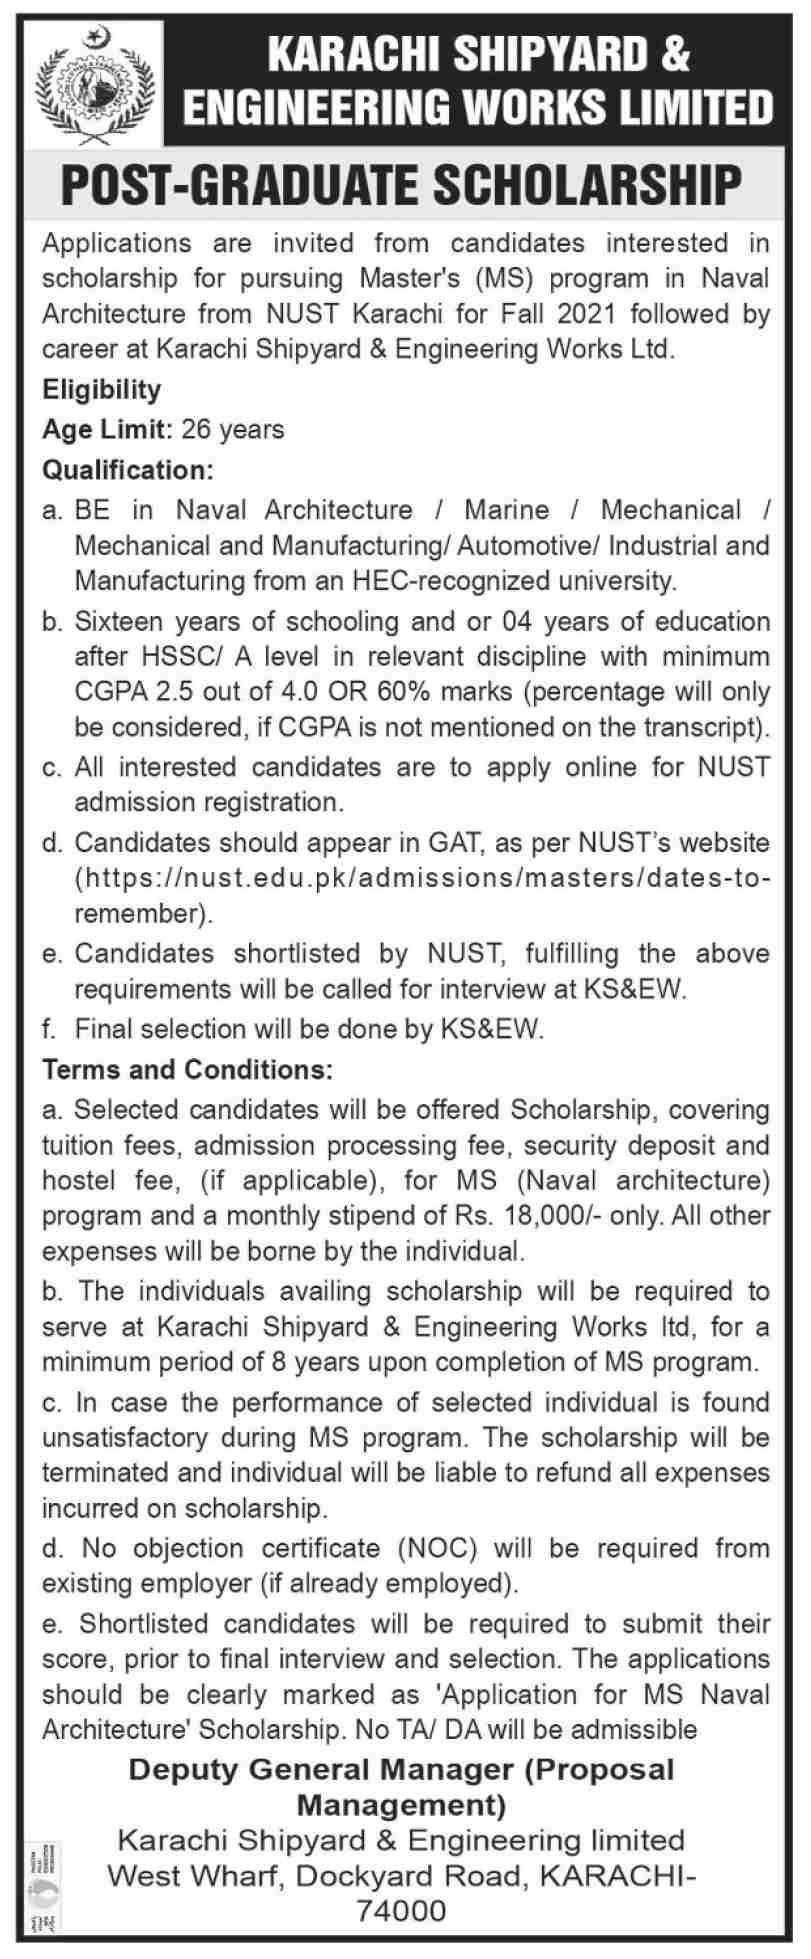 Karachi Shipyard Post Graduate Scholarship 2021